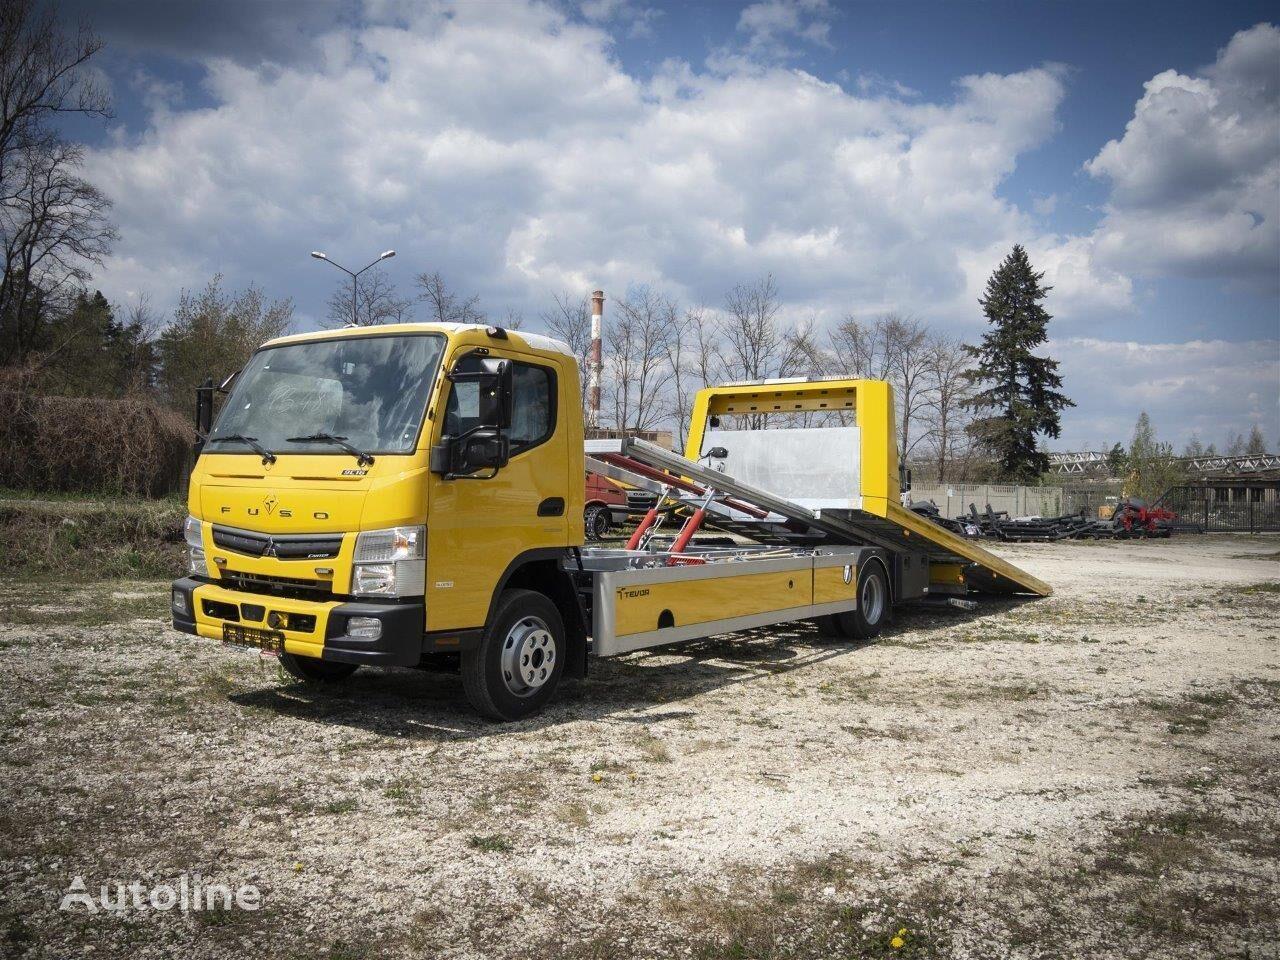 new MITSUBISHI FUSO CANTER 9C18 tow truck